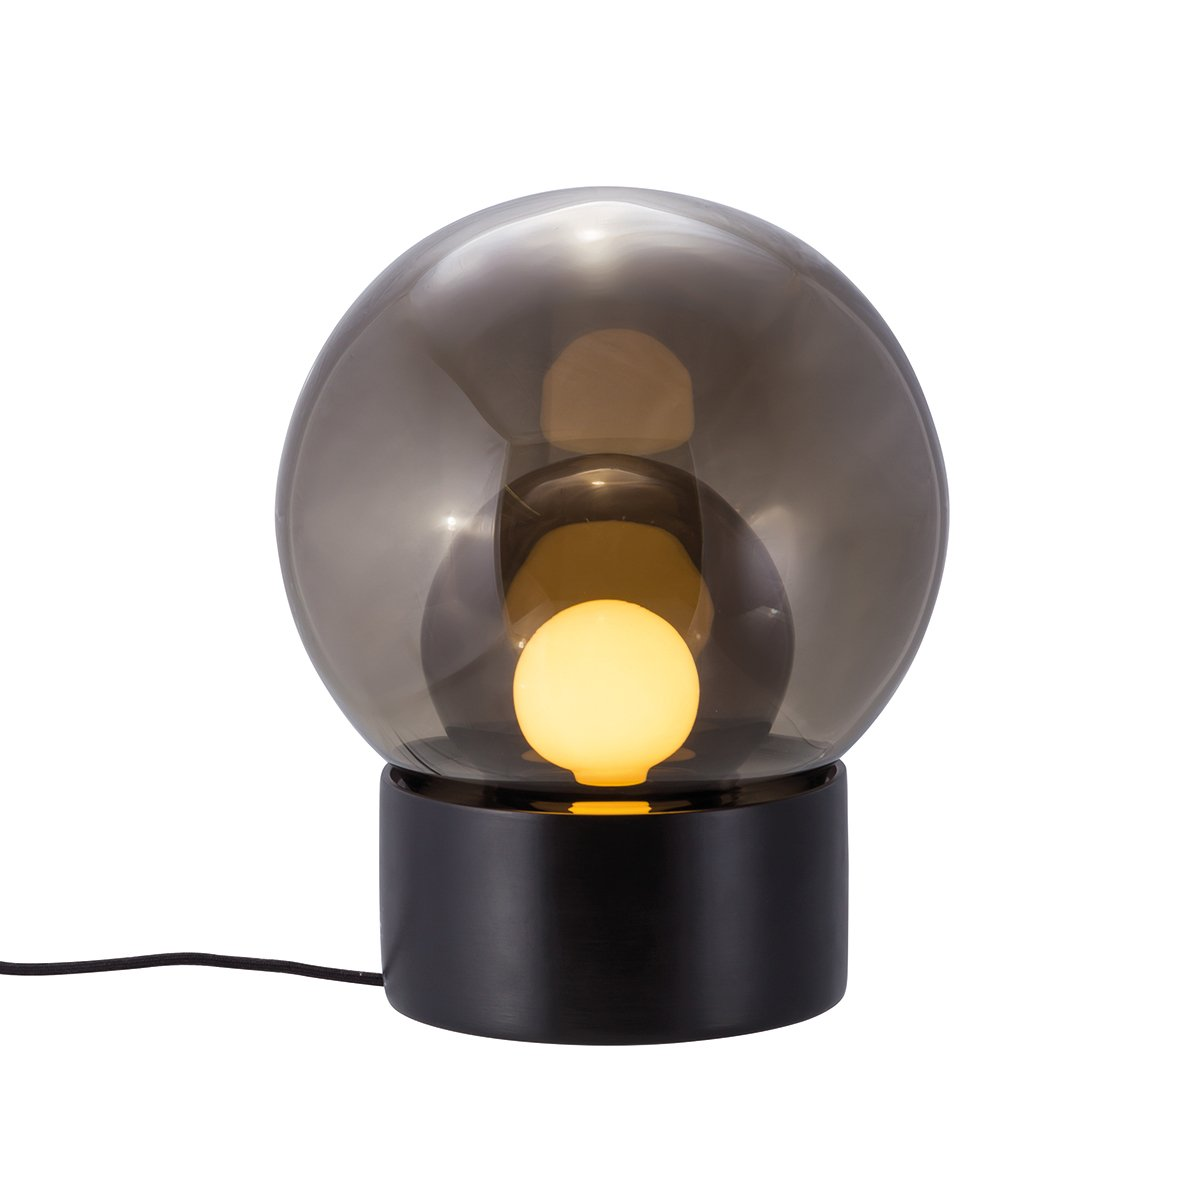 Pulpo Boule Tafellamp door Sebastian Herkner - Zwart - Smoke Grey